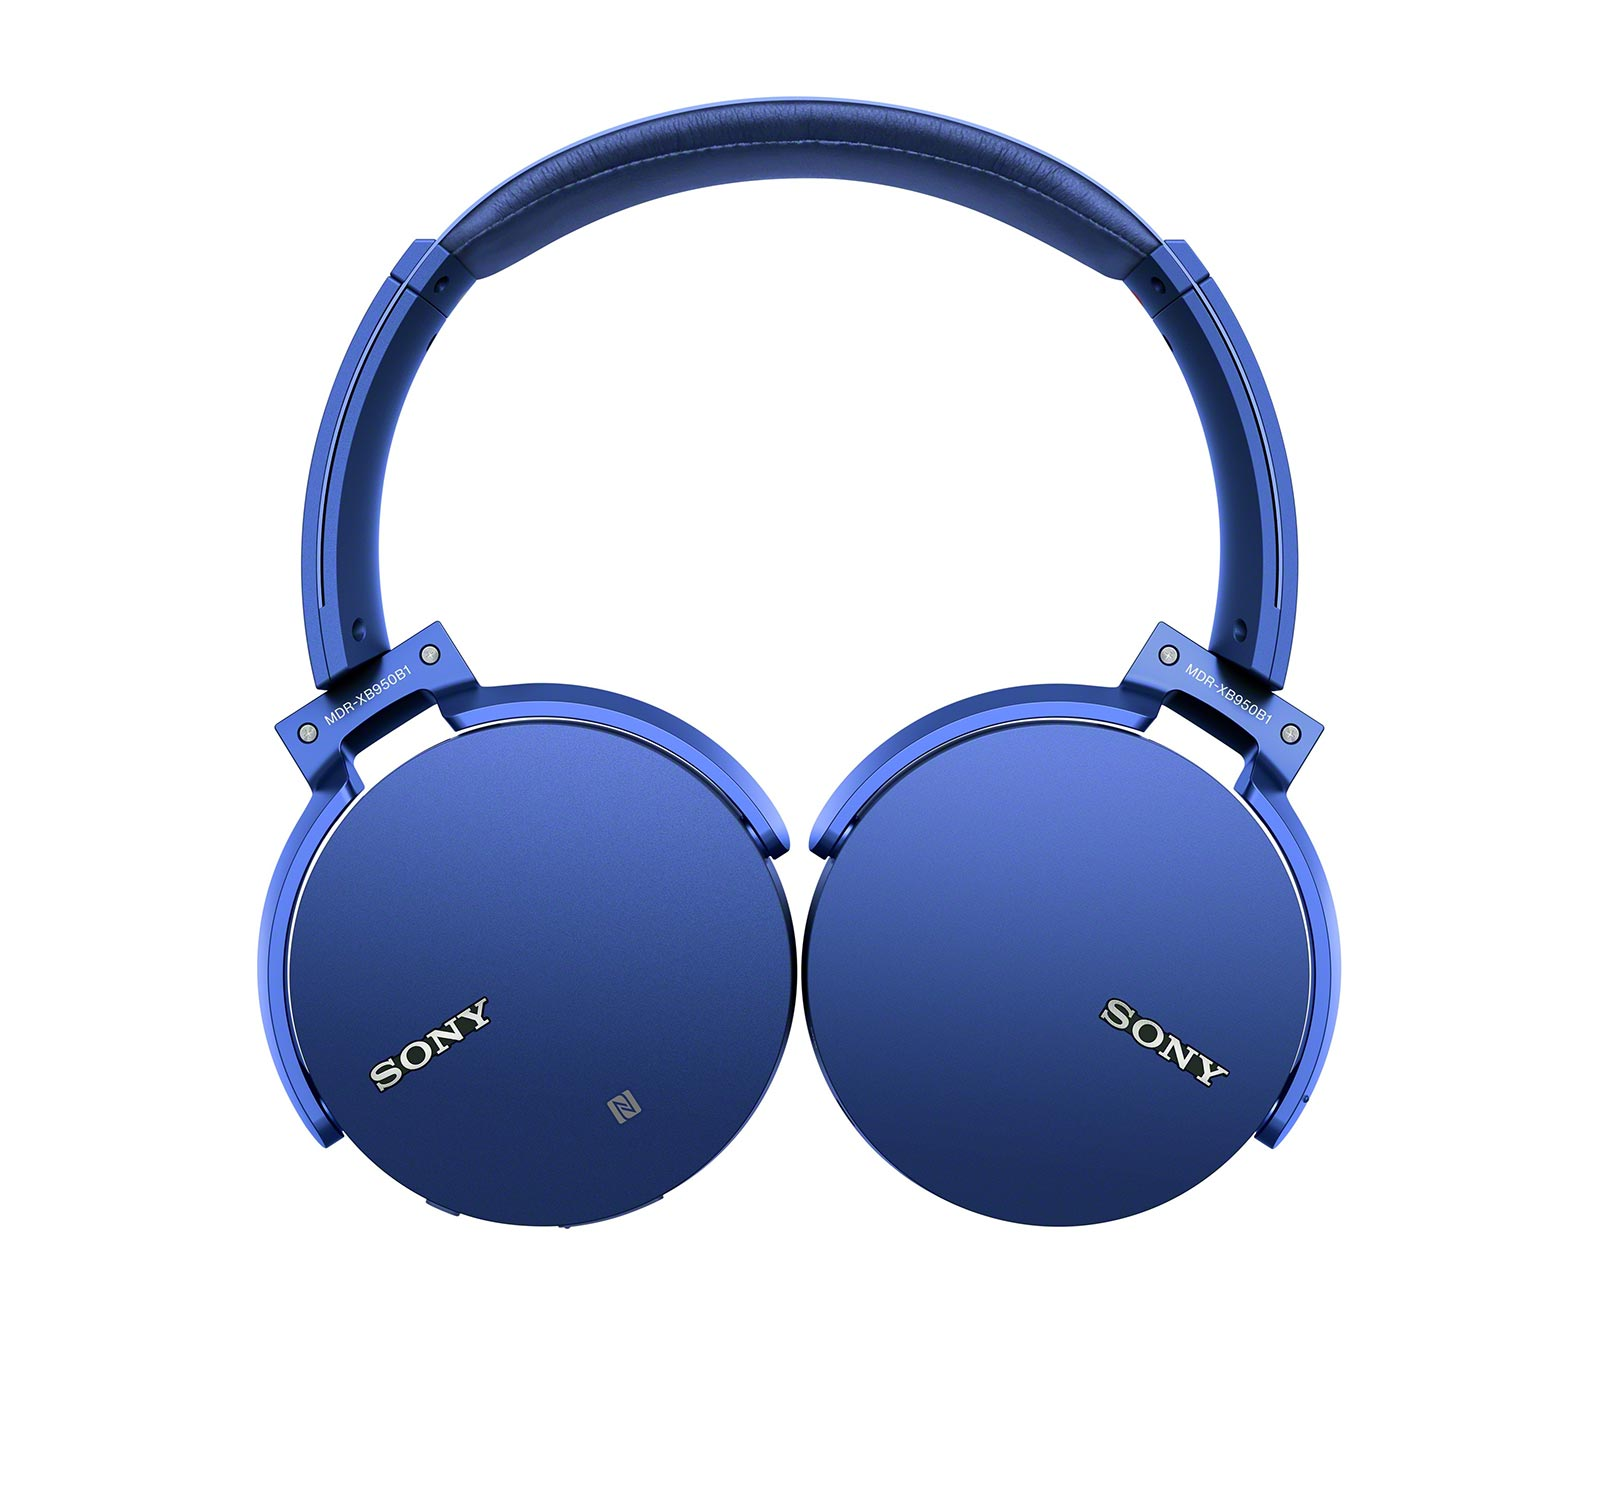 Sony-MDRXB950B1-L-Blue-Over-ear-Bluetooth-Headphones thumbnail 5